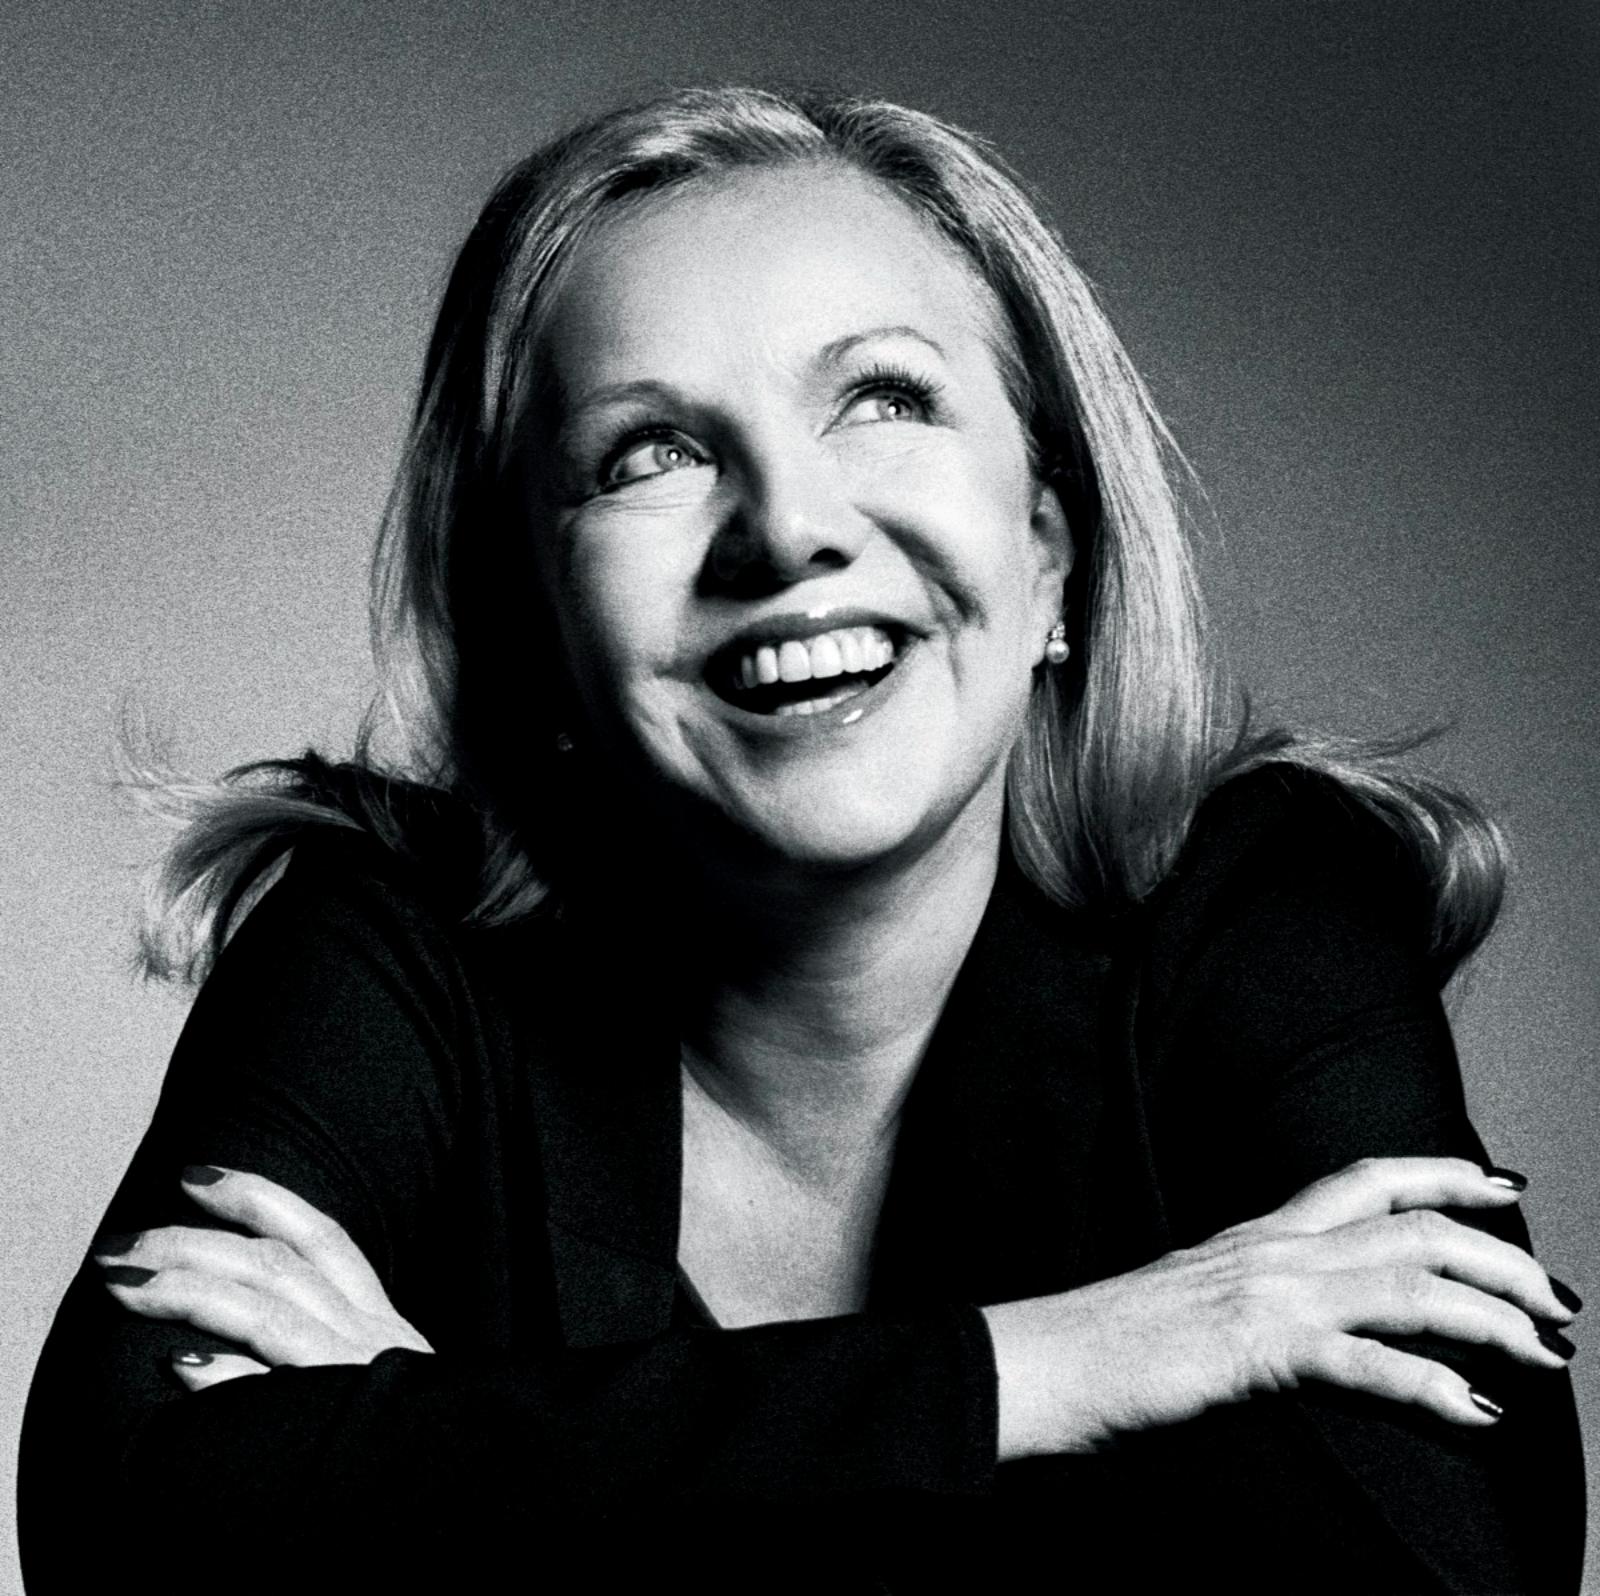 Photo of Susan Stroman